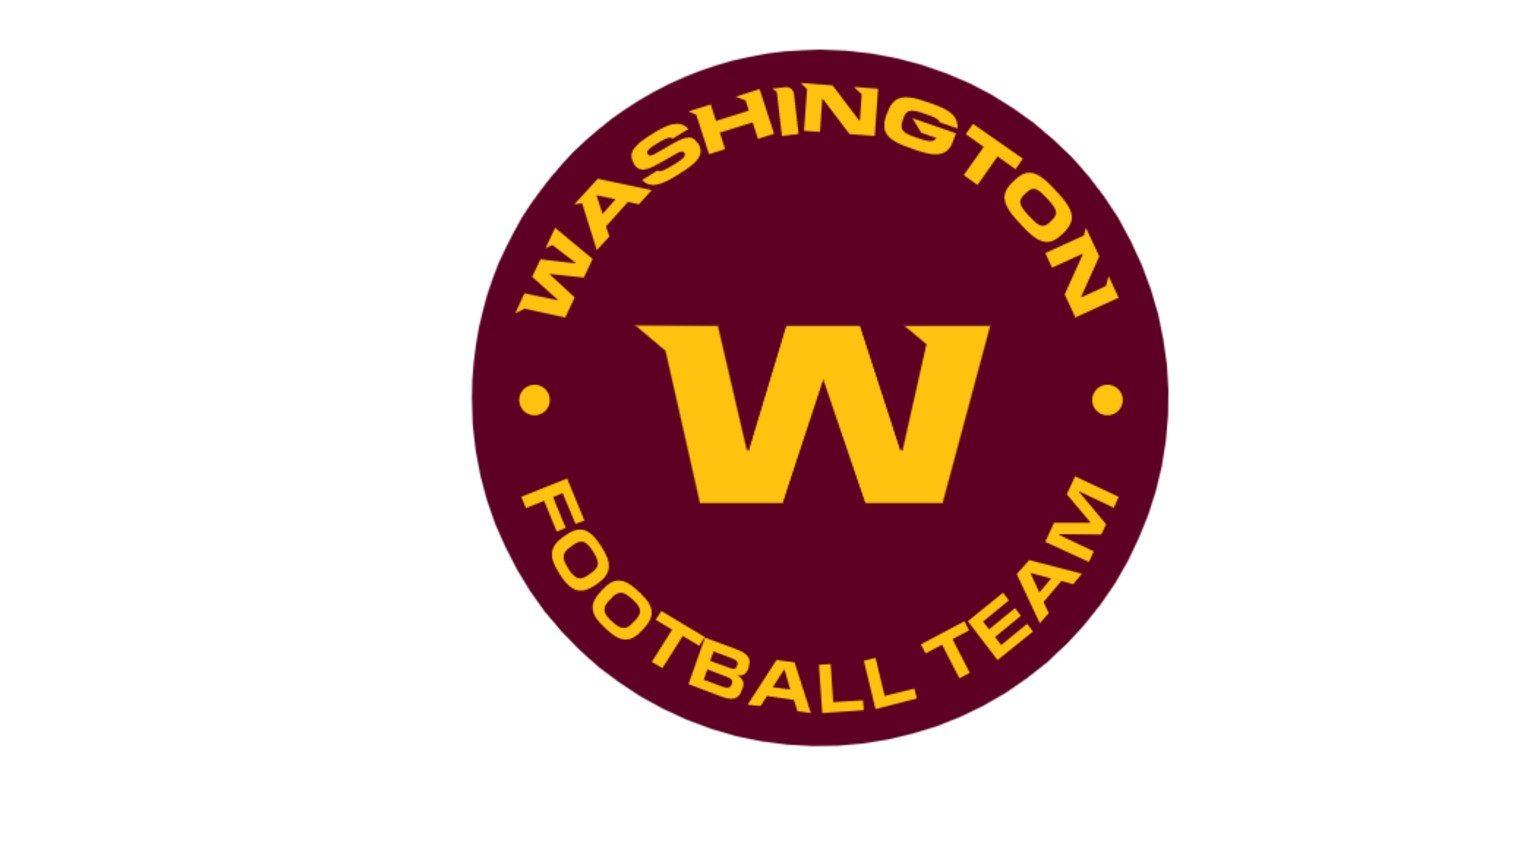 Washingtong team logo